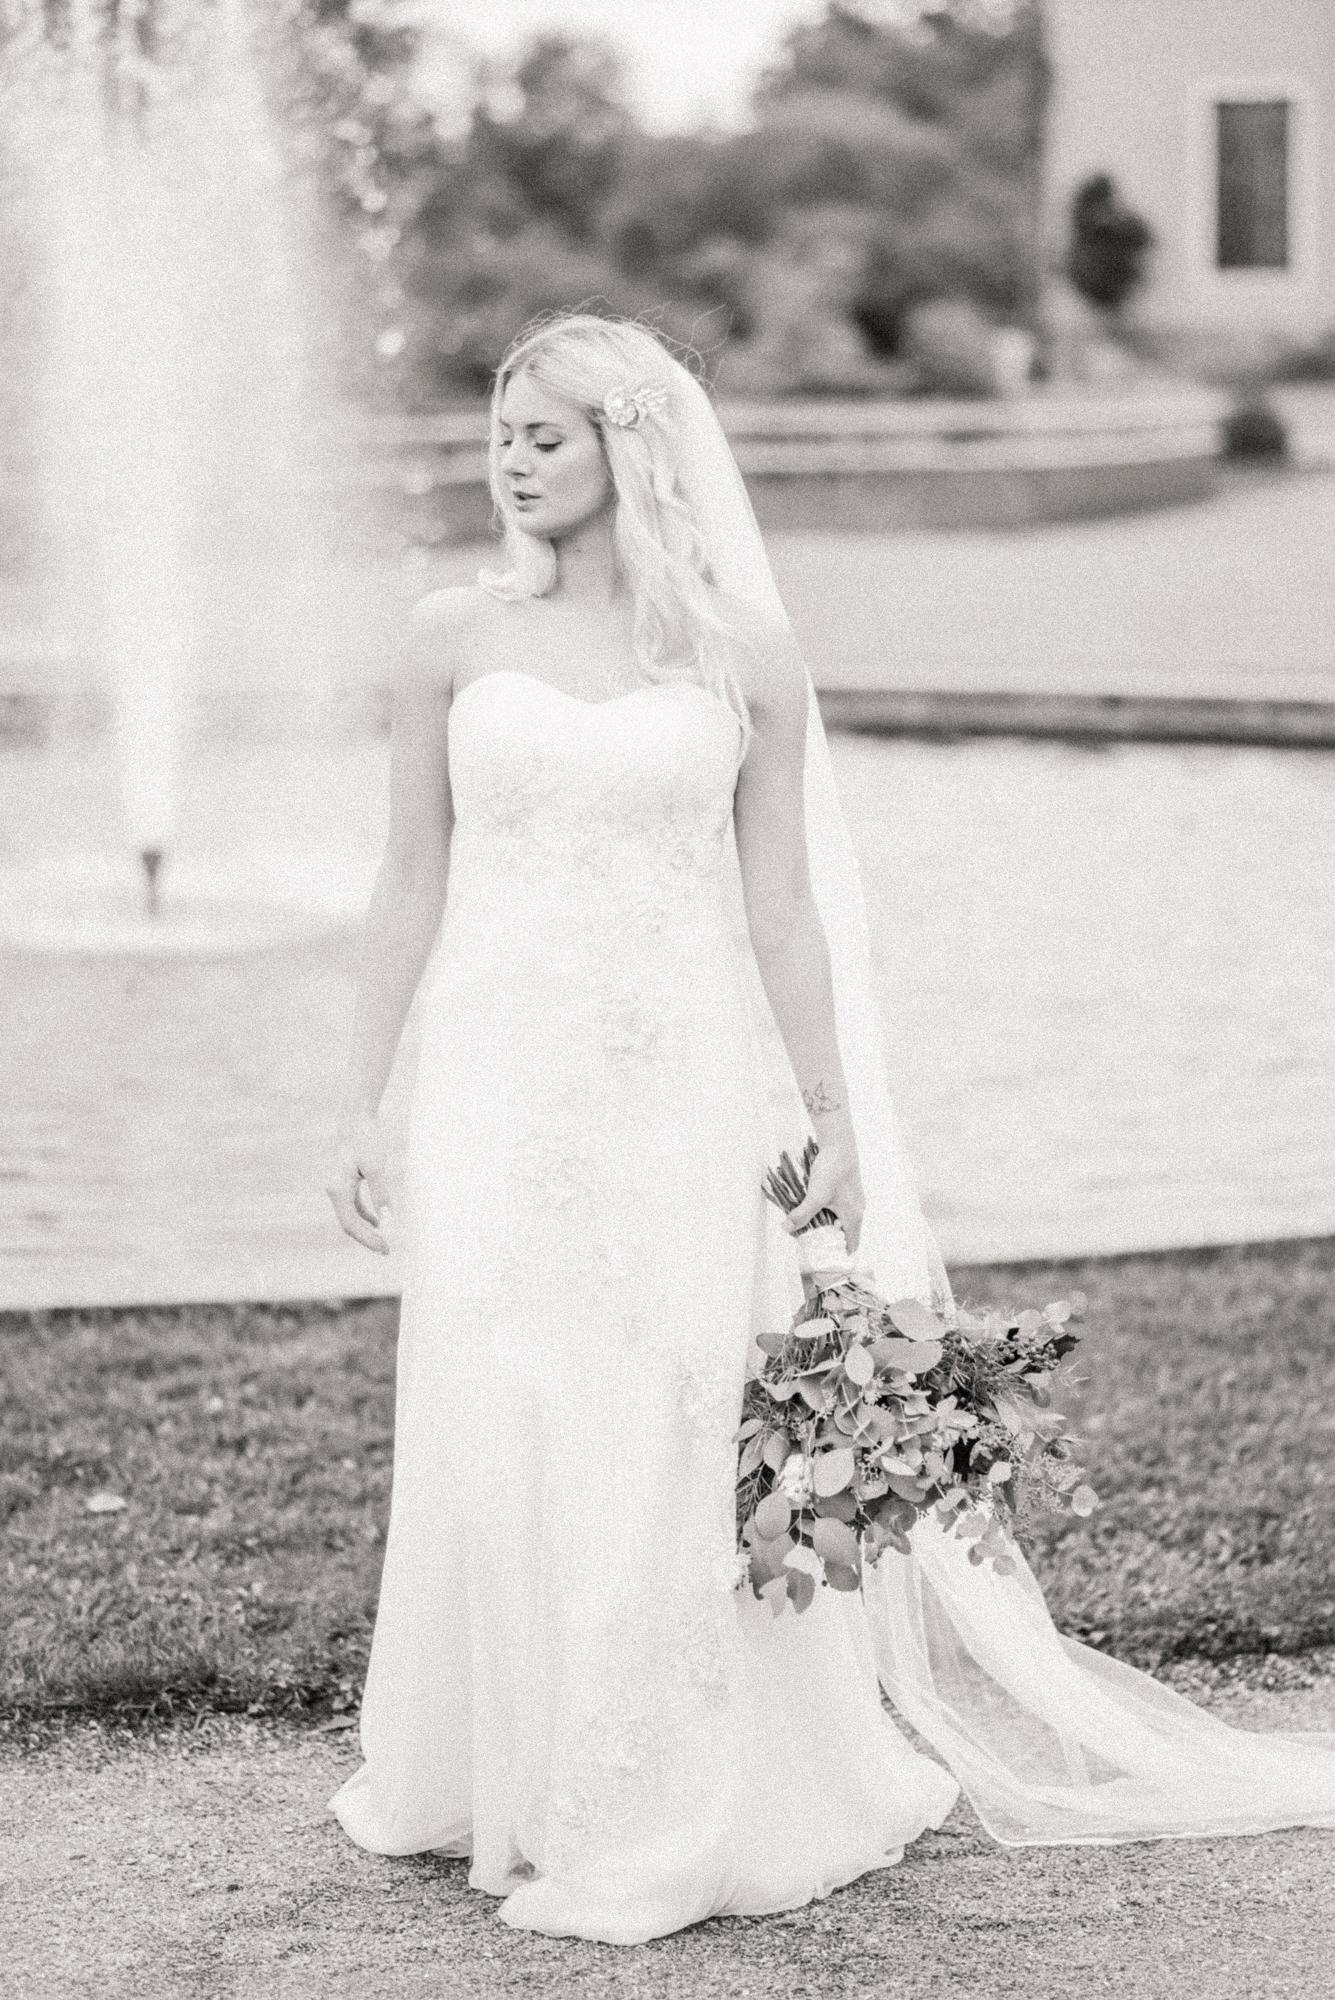 Elegant Organic Fall Swedish Bridal Wedding Styled Shoot - Erika Alvarenga Photography-13.jpg